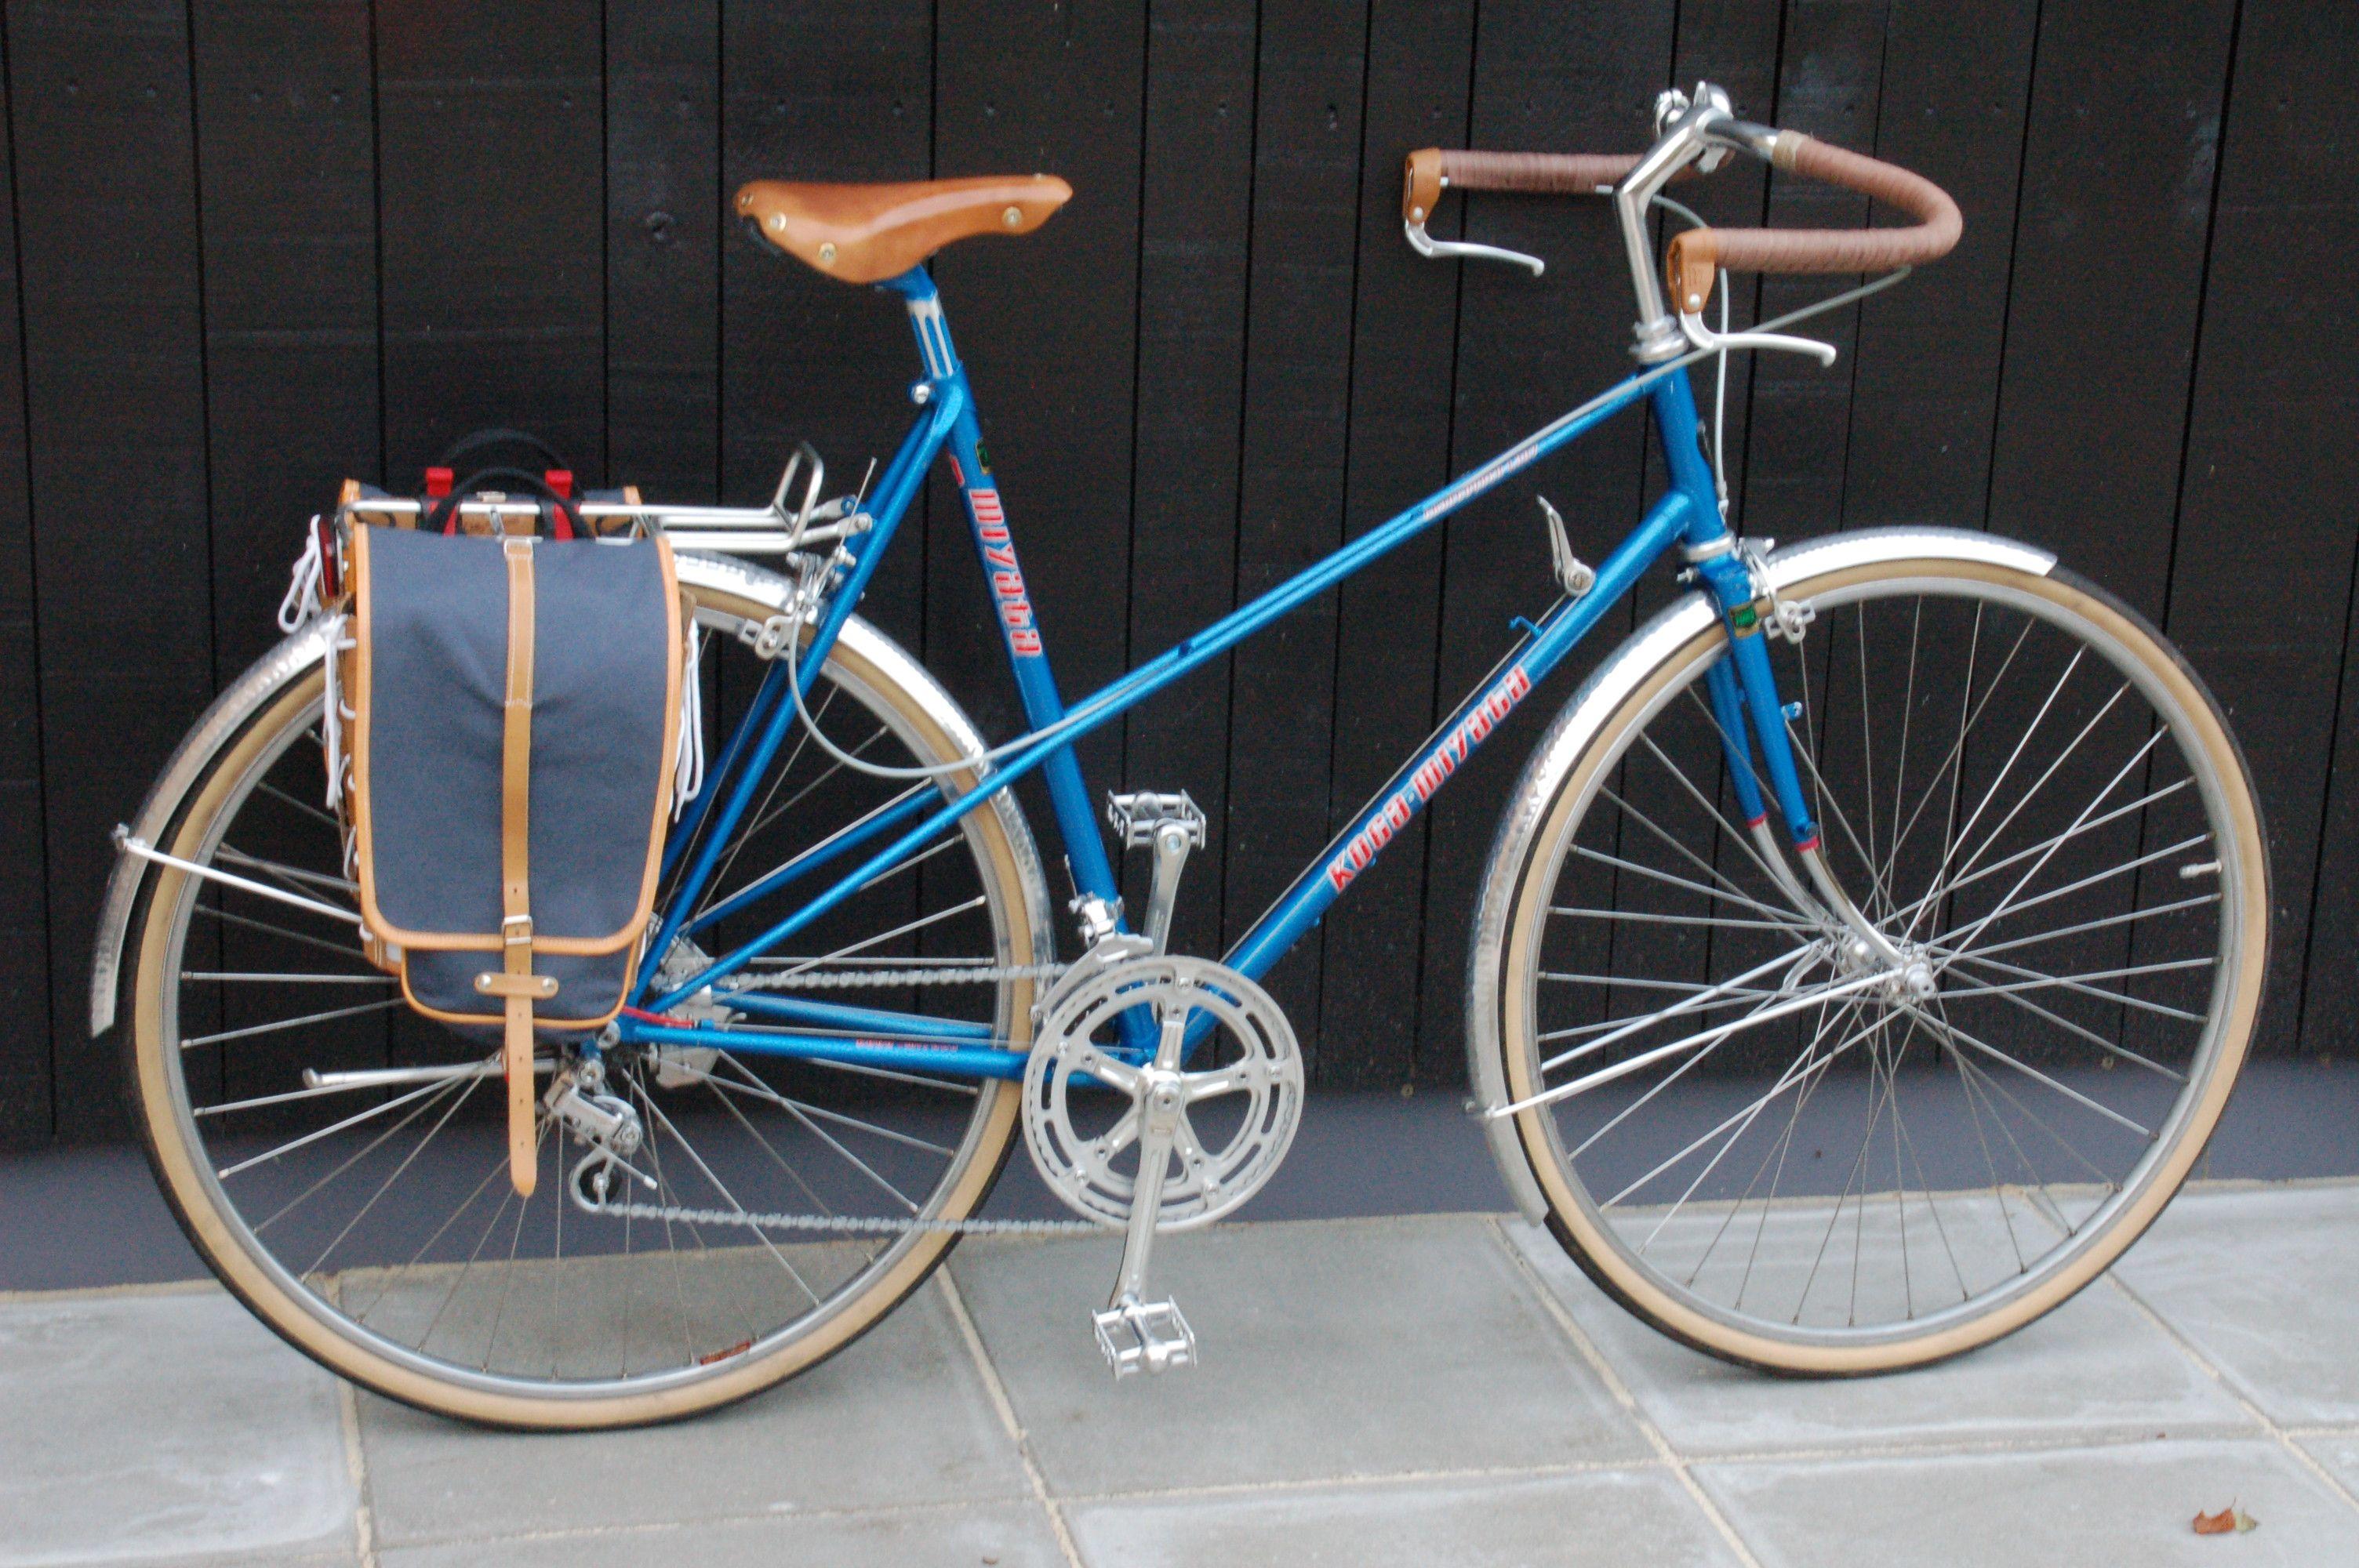 koga miyata cycle style mixte frame gilles berthoud - Mixte Frame